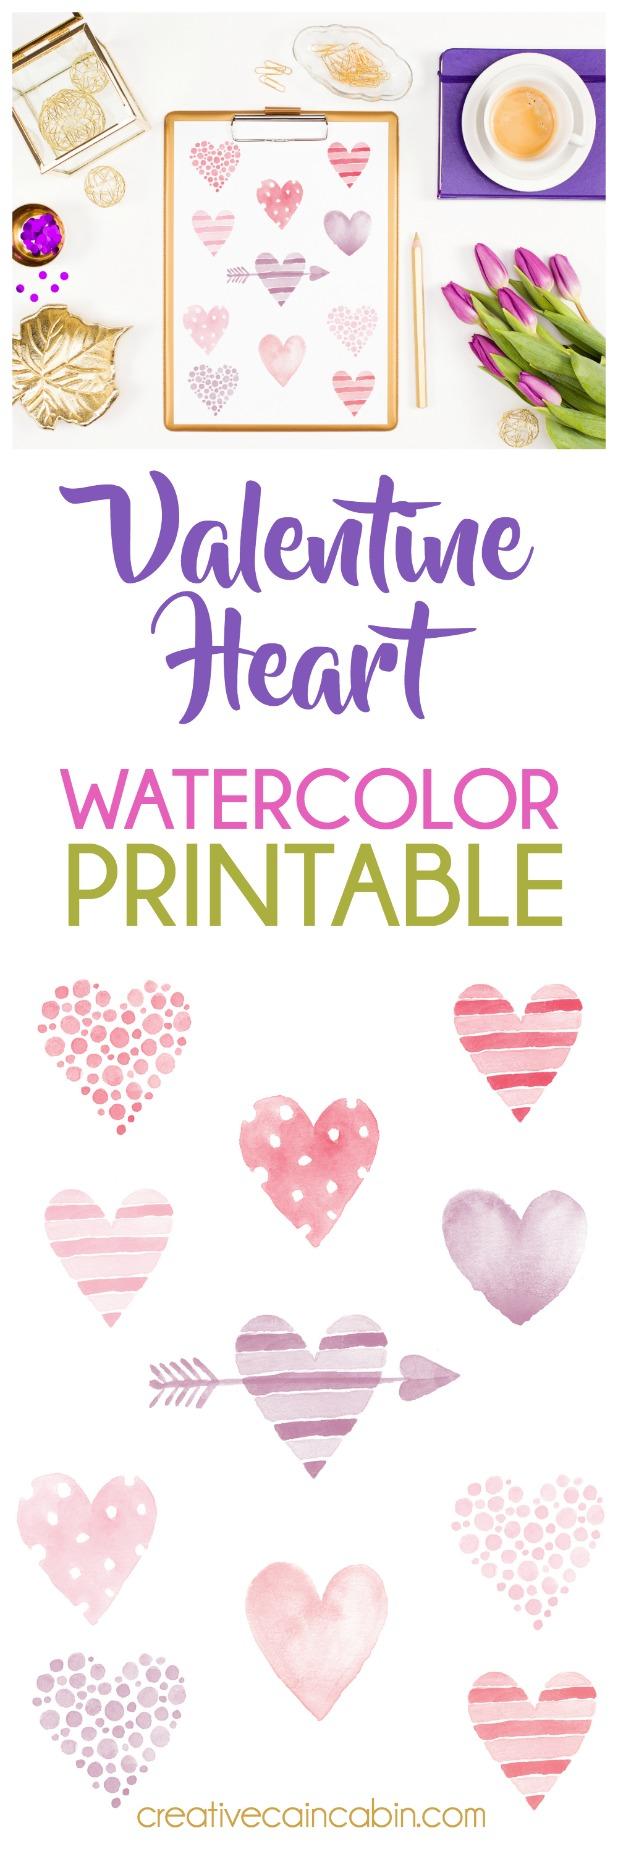 Valentine Heart Watercolor Printable